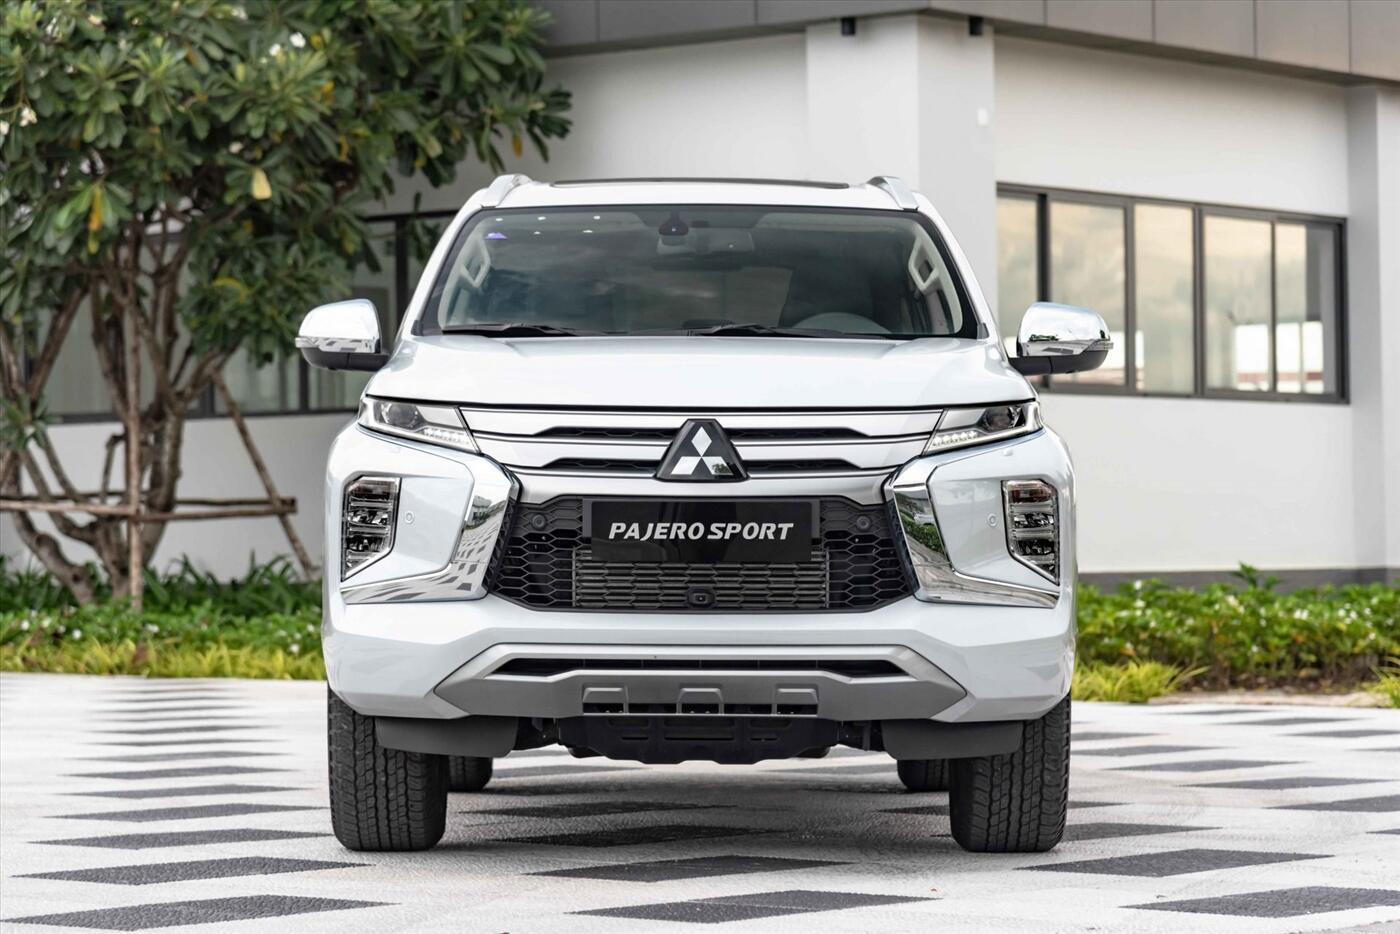 New Mitsubishi Pajero Sport Dầu 4x4 STD